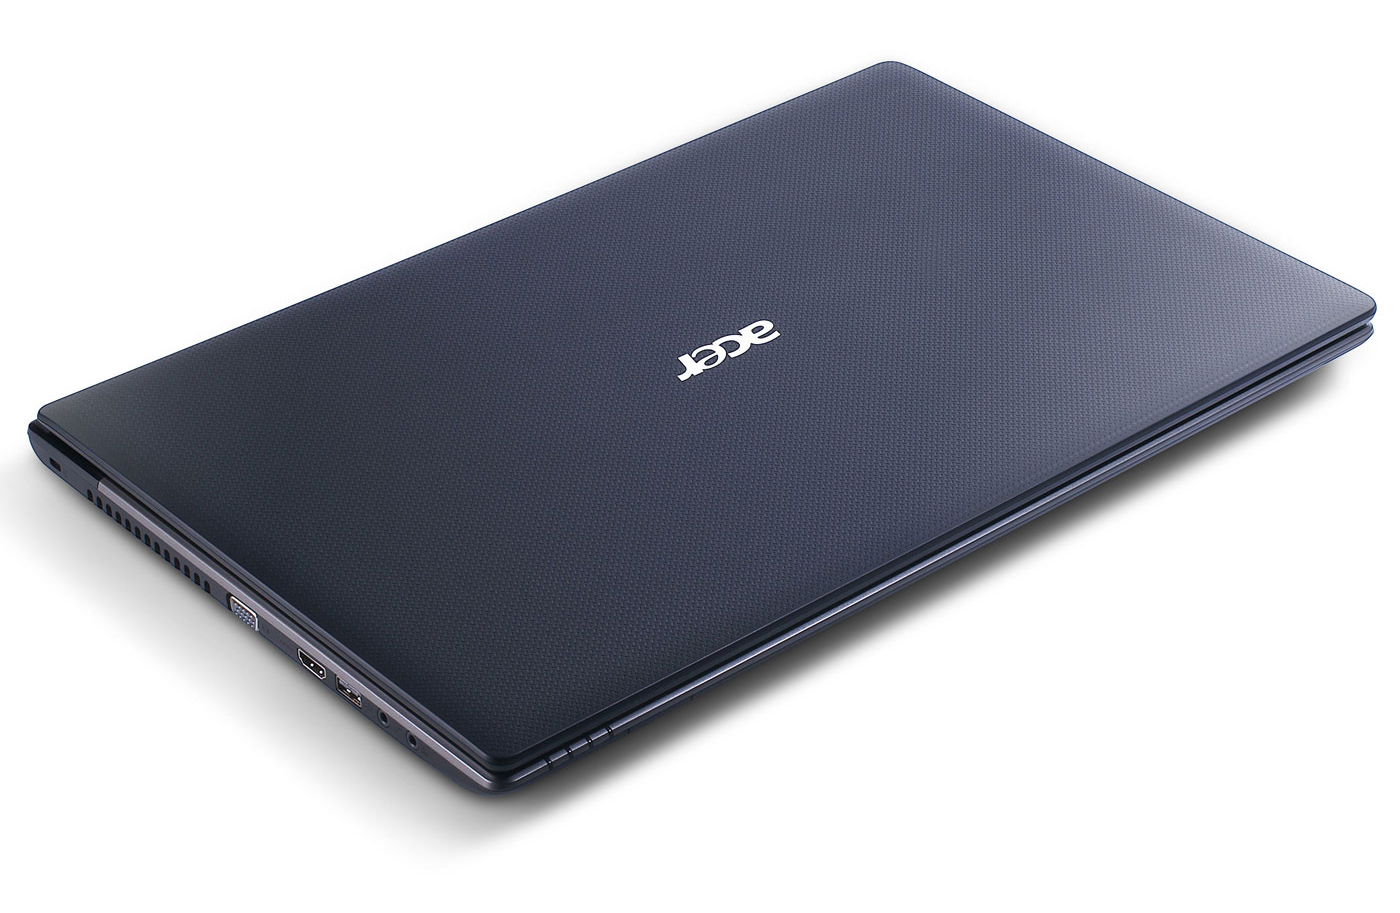 ноутбук Acer Aspire 7750/7750G/7750Z/7750ZG